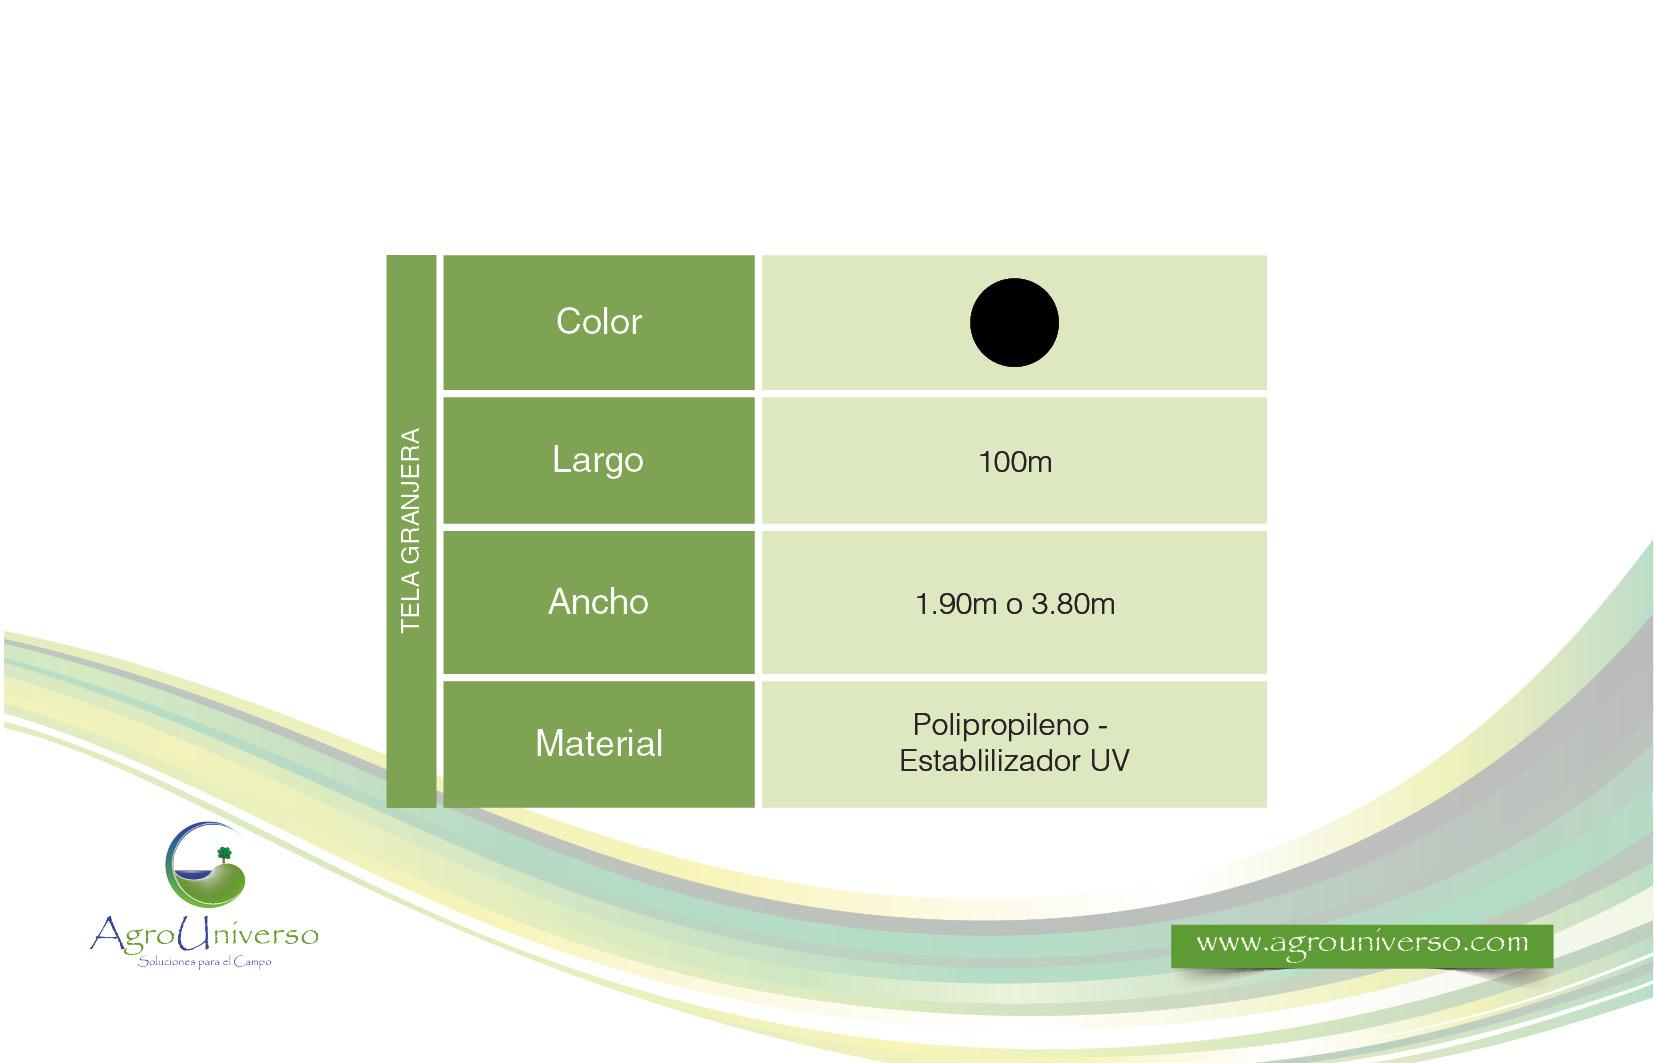 Catlogo-de-productos-Agrouniverso-25